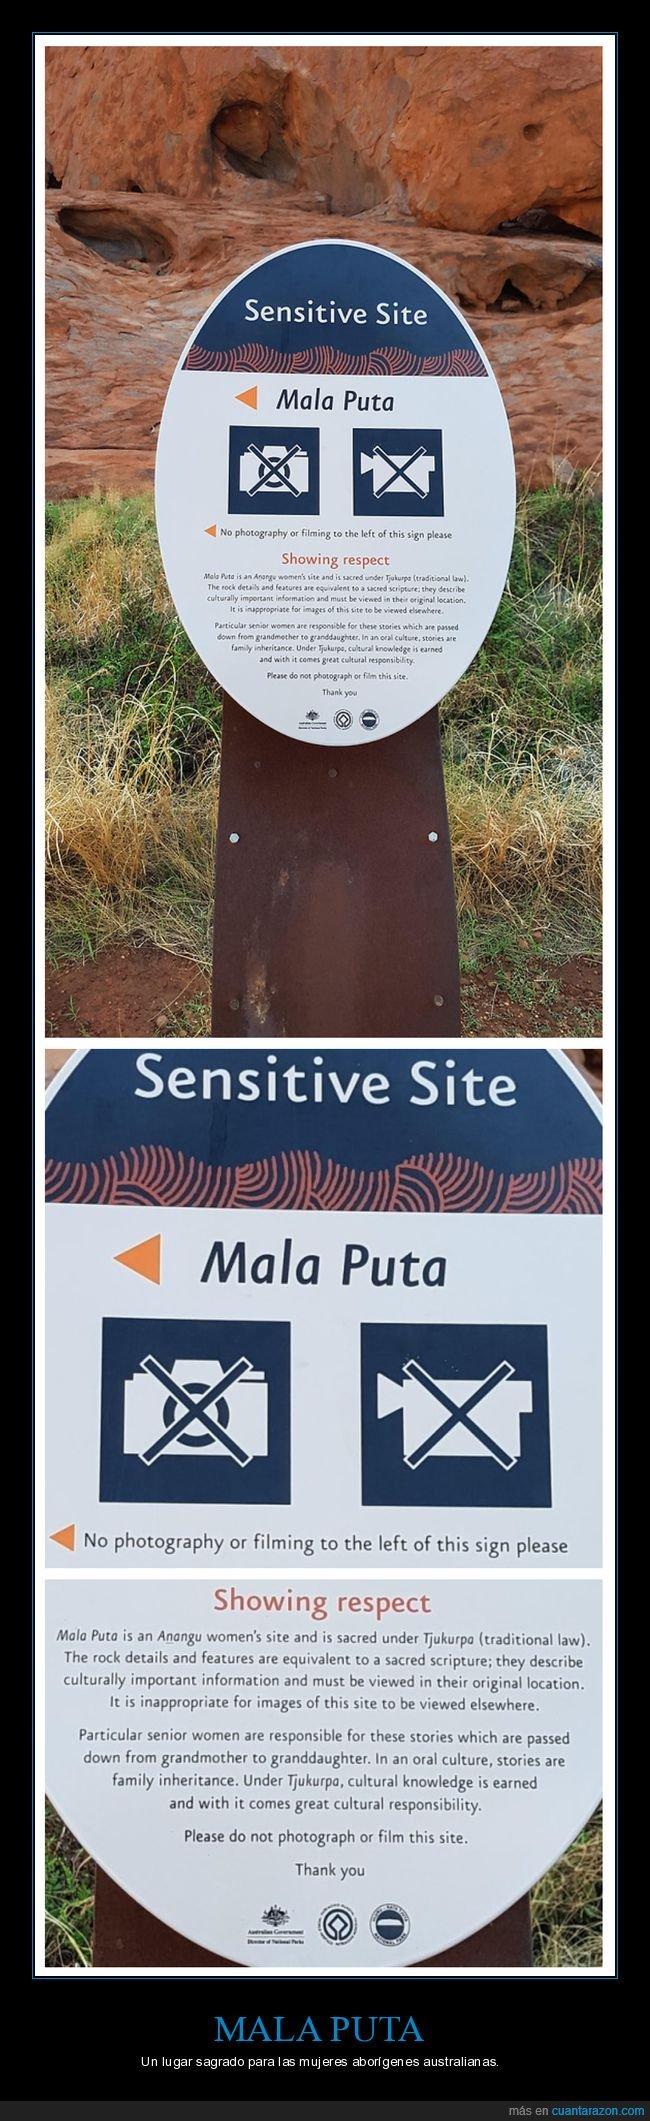 aborígenes,australia,lugar sagrado,mala puta